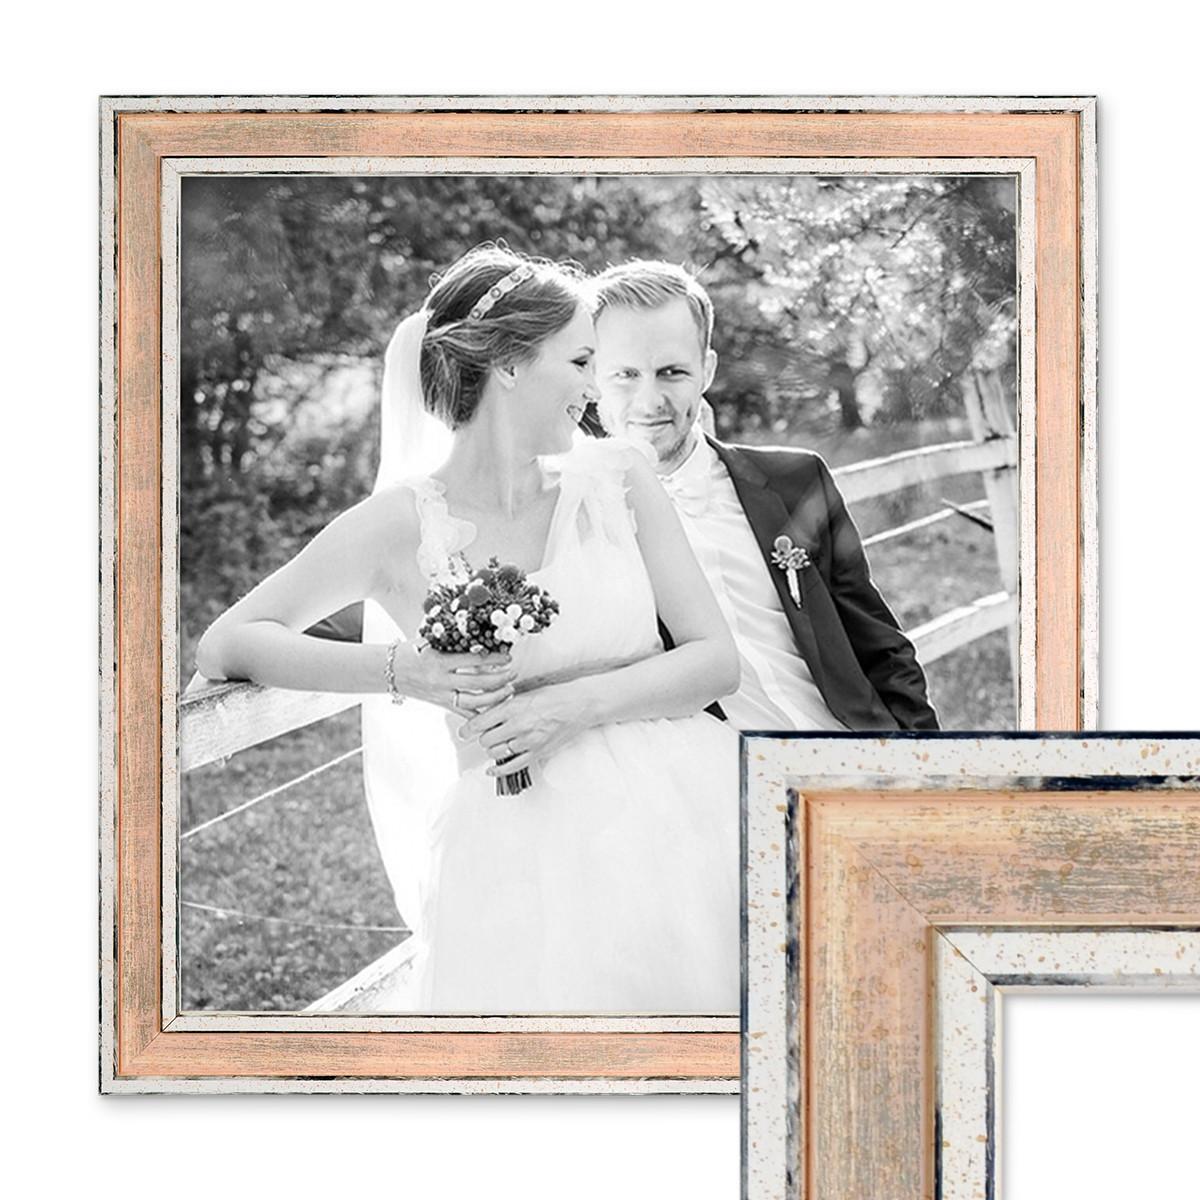 Bilderrahmen Pastell / Alt-Weiß Rosa 30x30 cm Massivholz mit Vintage ...